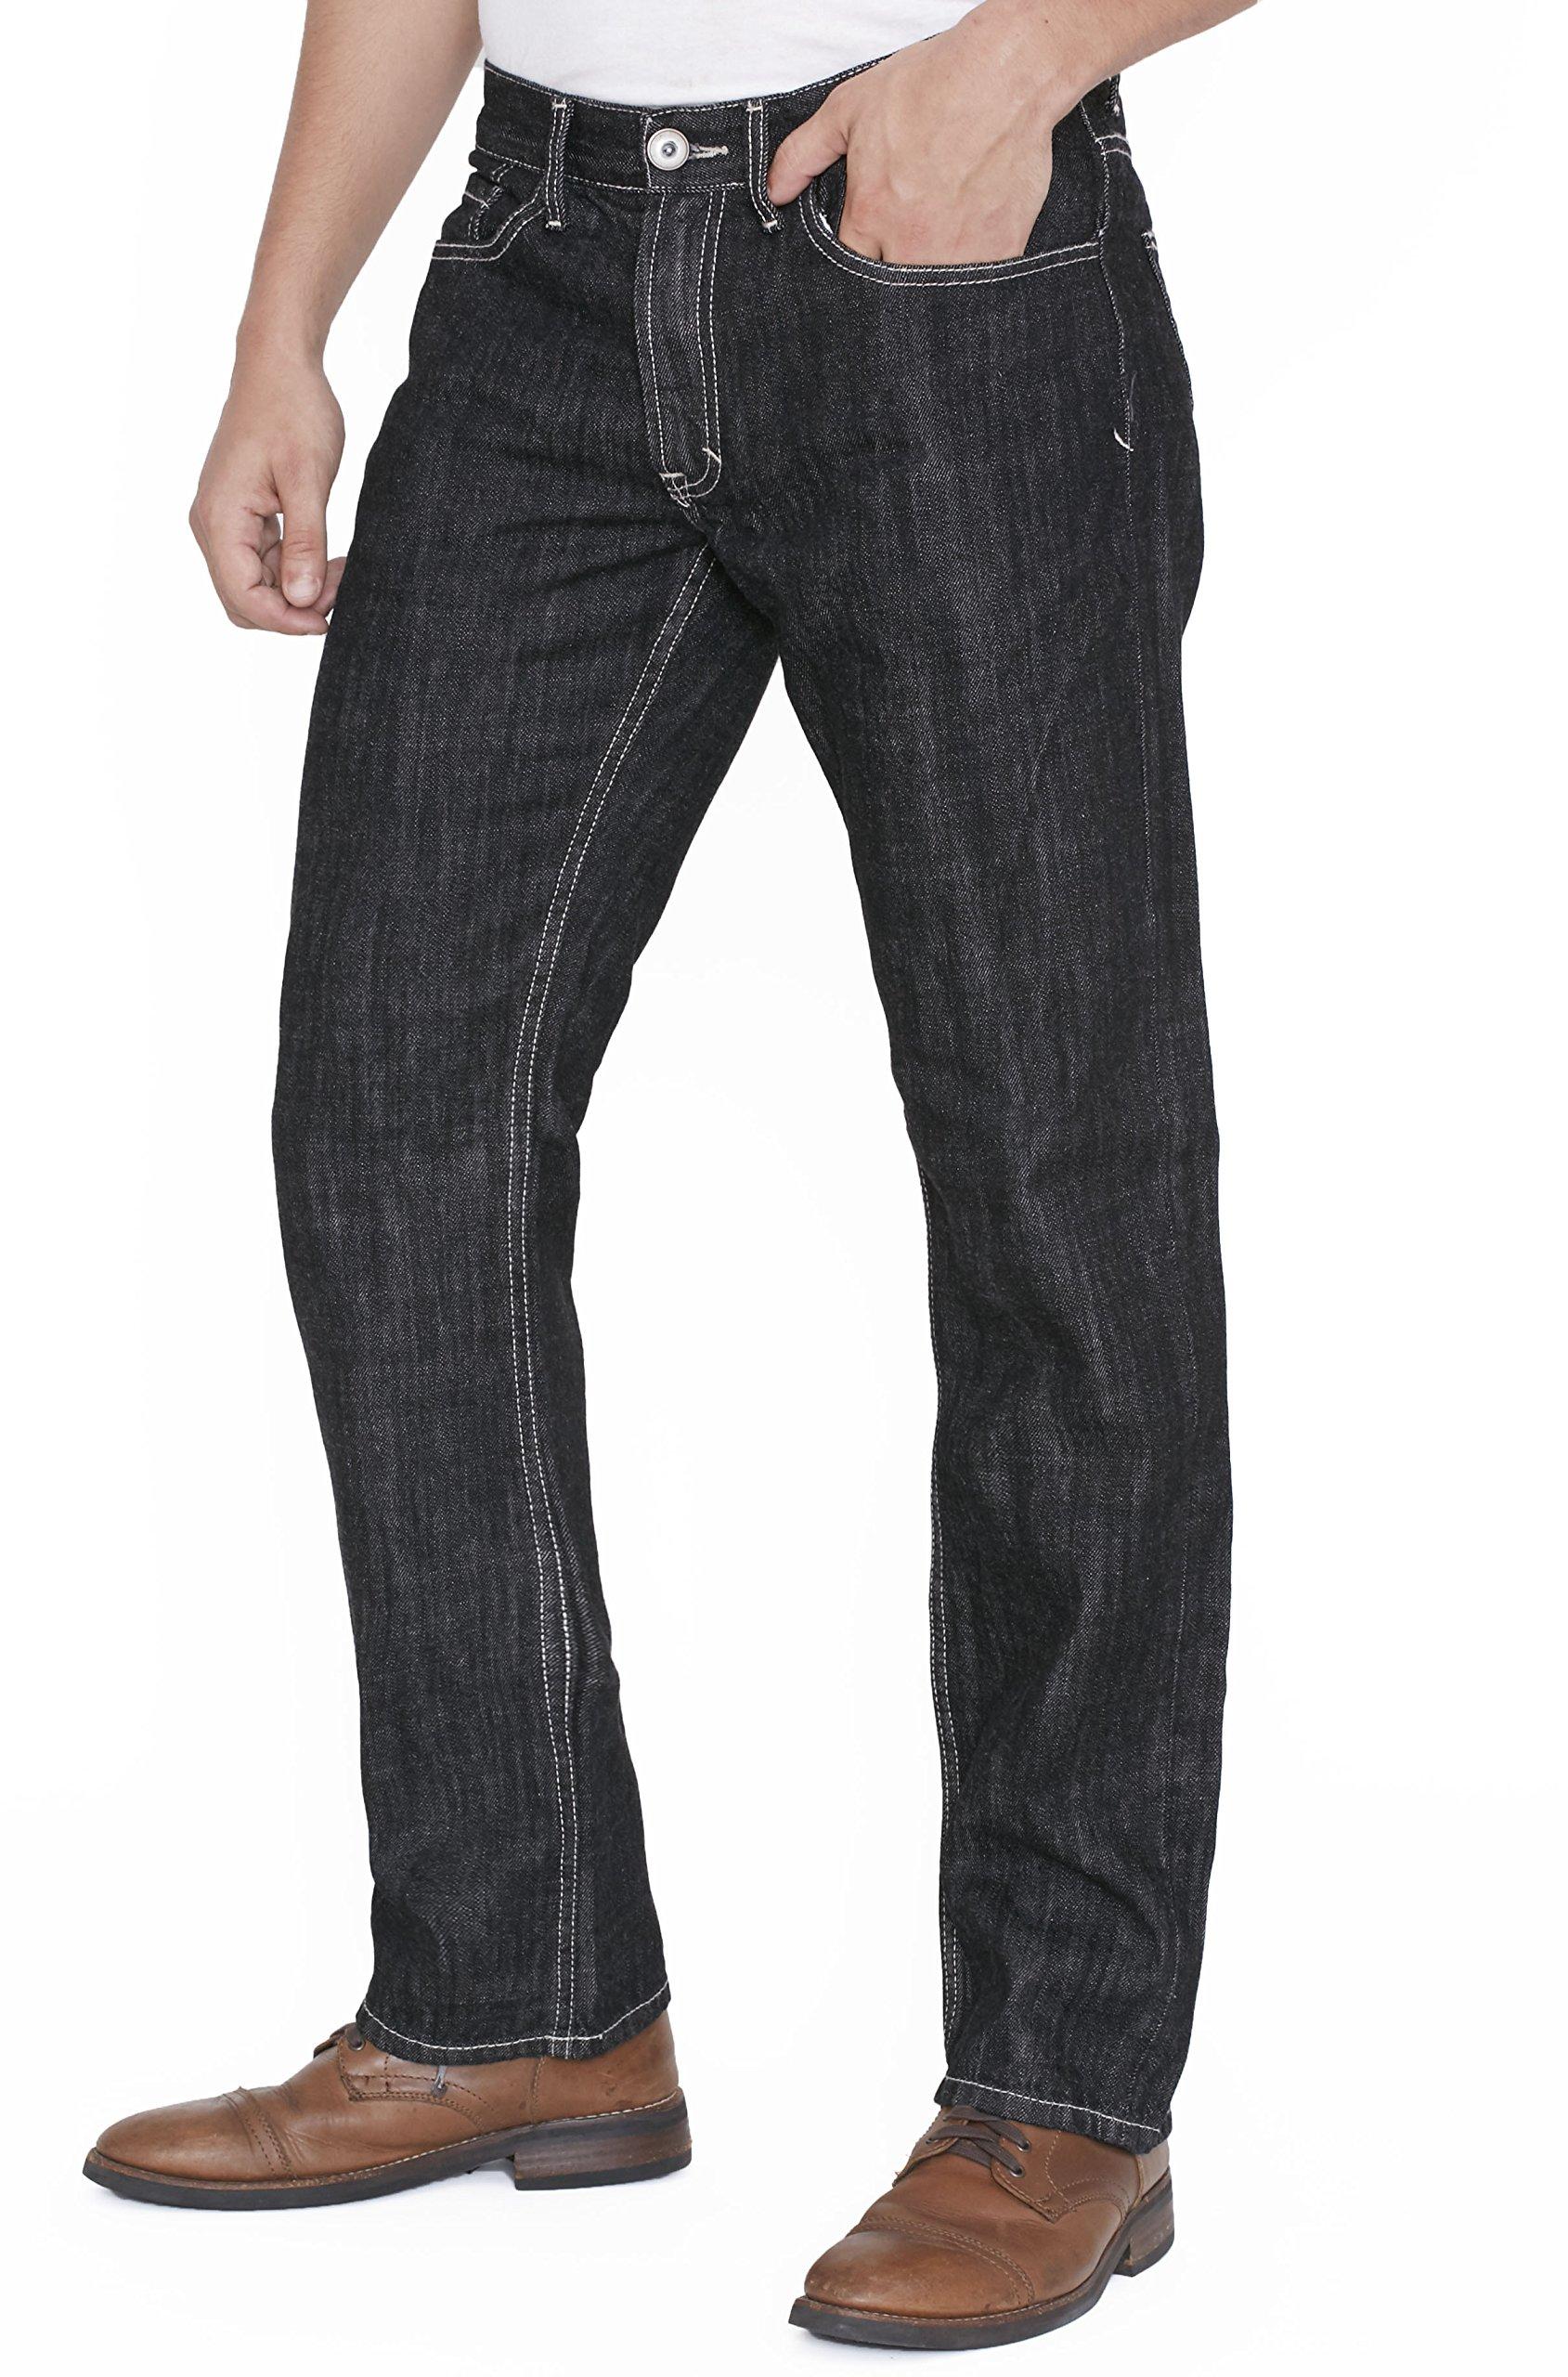 New York Avenue Men's Slim Fit Black Jeans – Comfortable Straight Cut